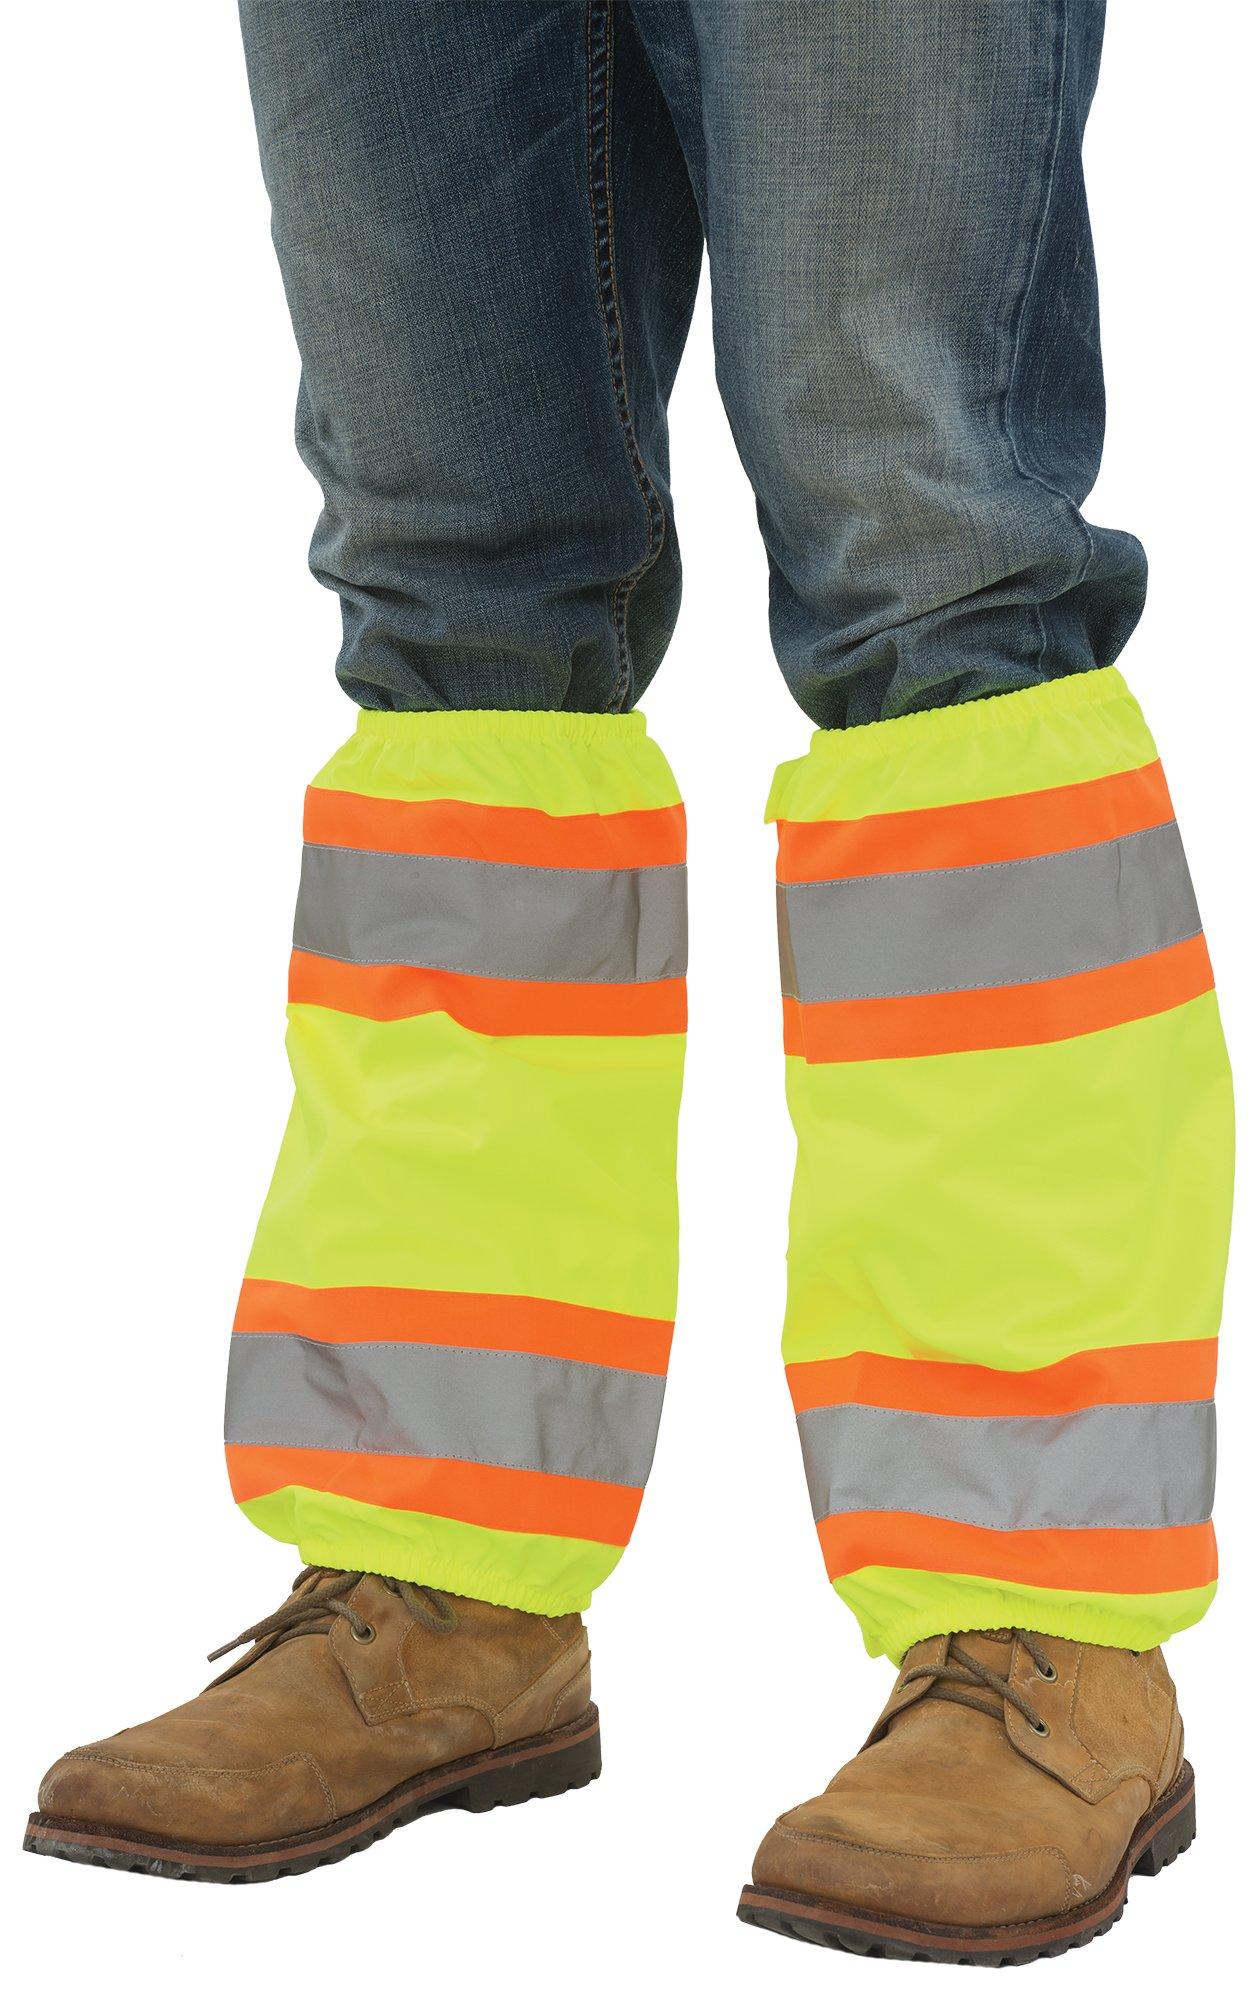 ERB Safety 61586 S487 Contrasting Trim Leg Gaiters Accessories, One Size, Hi-Viz Lime